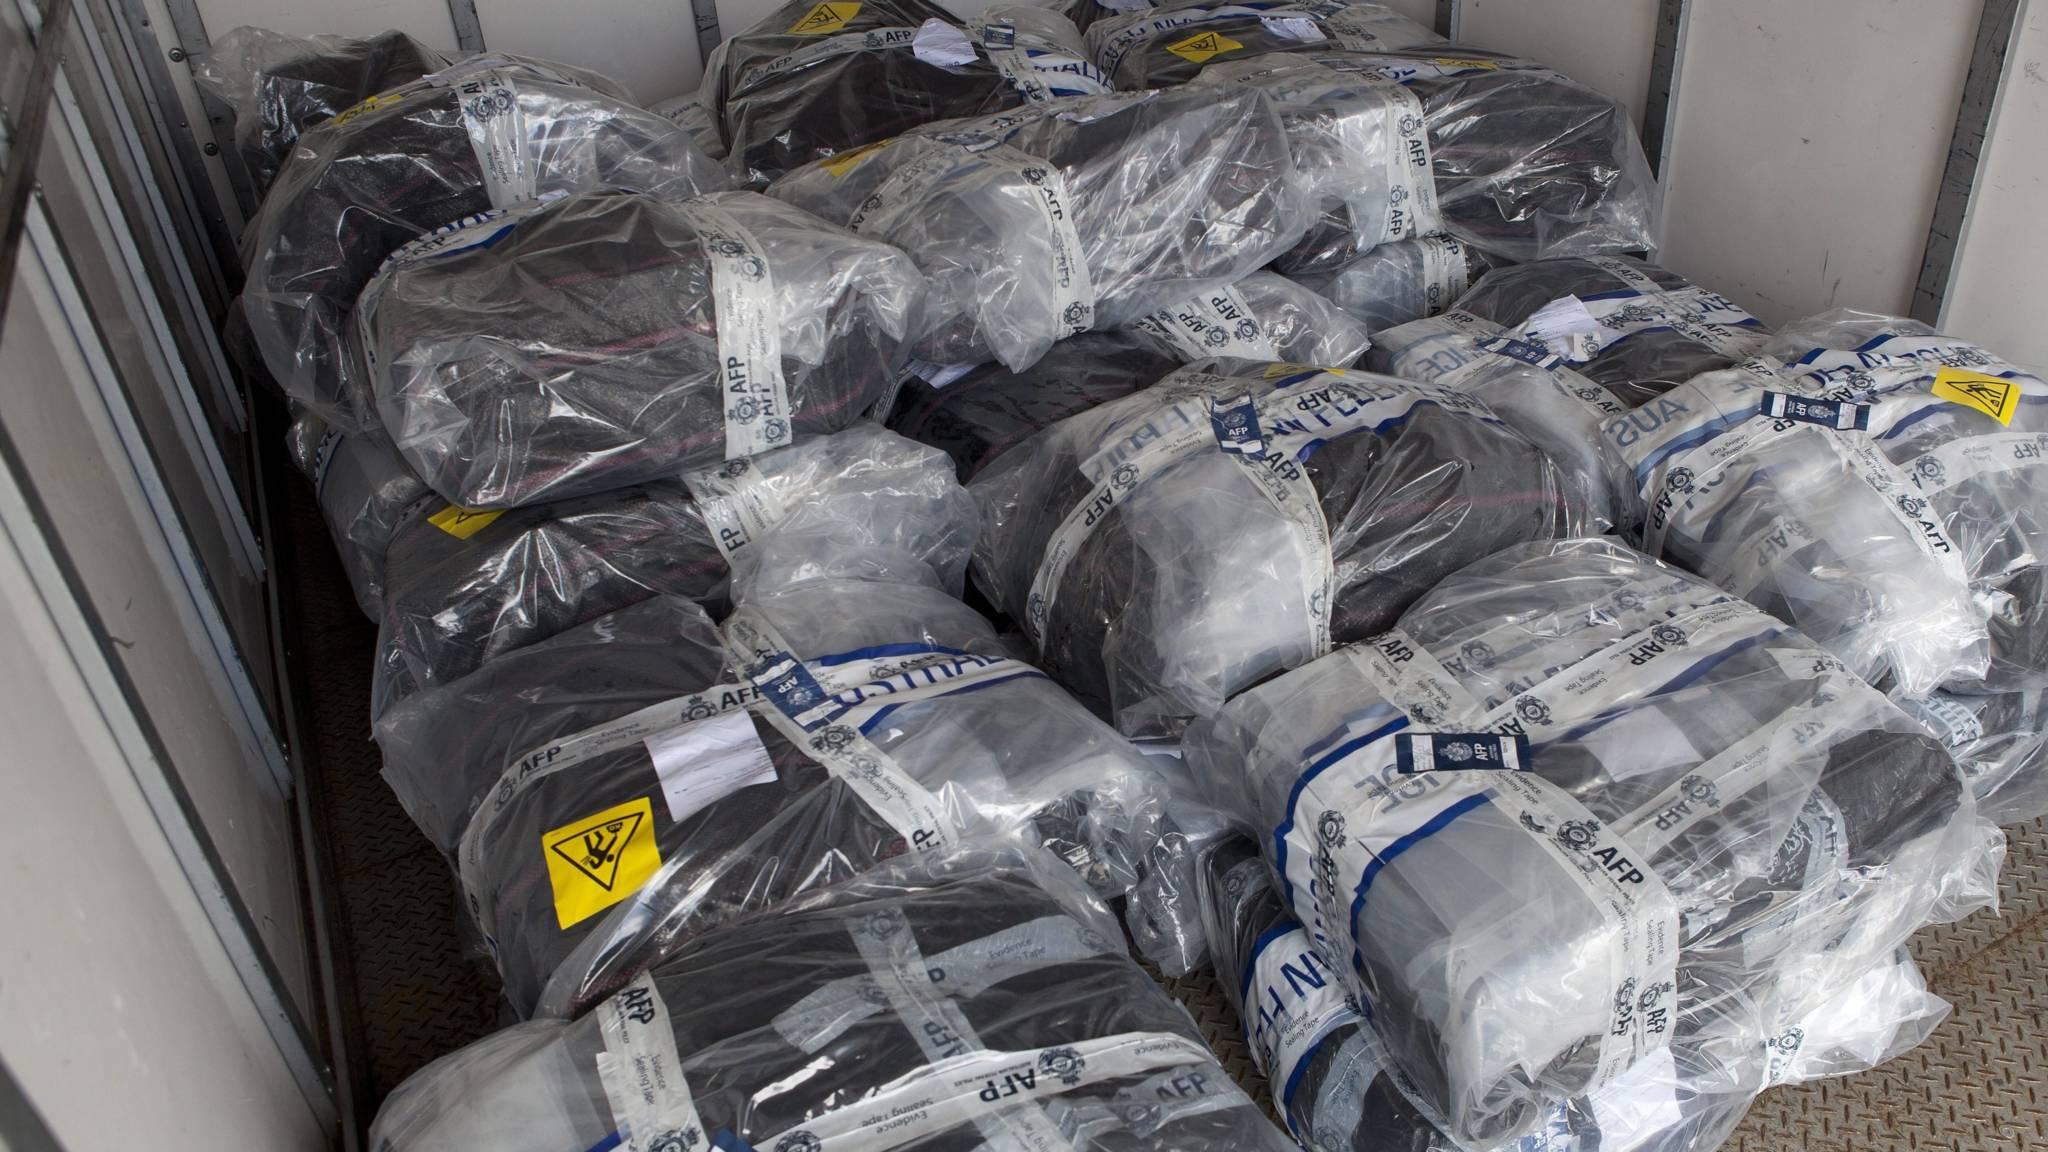 1400 kilo coke, 222 miljoen euro: enorme drugsvangst in Australië | NOS